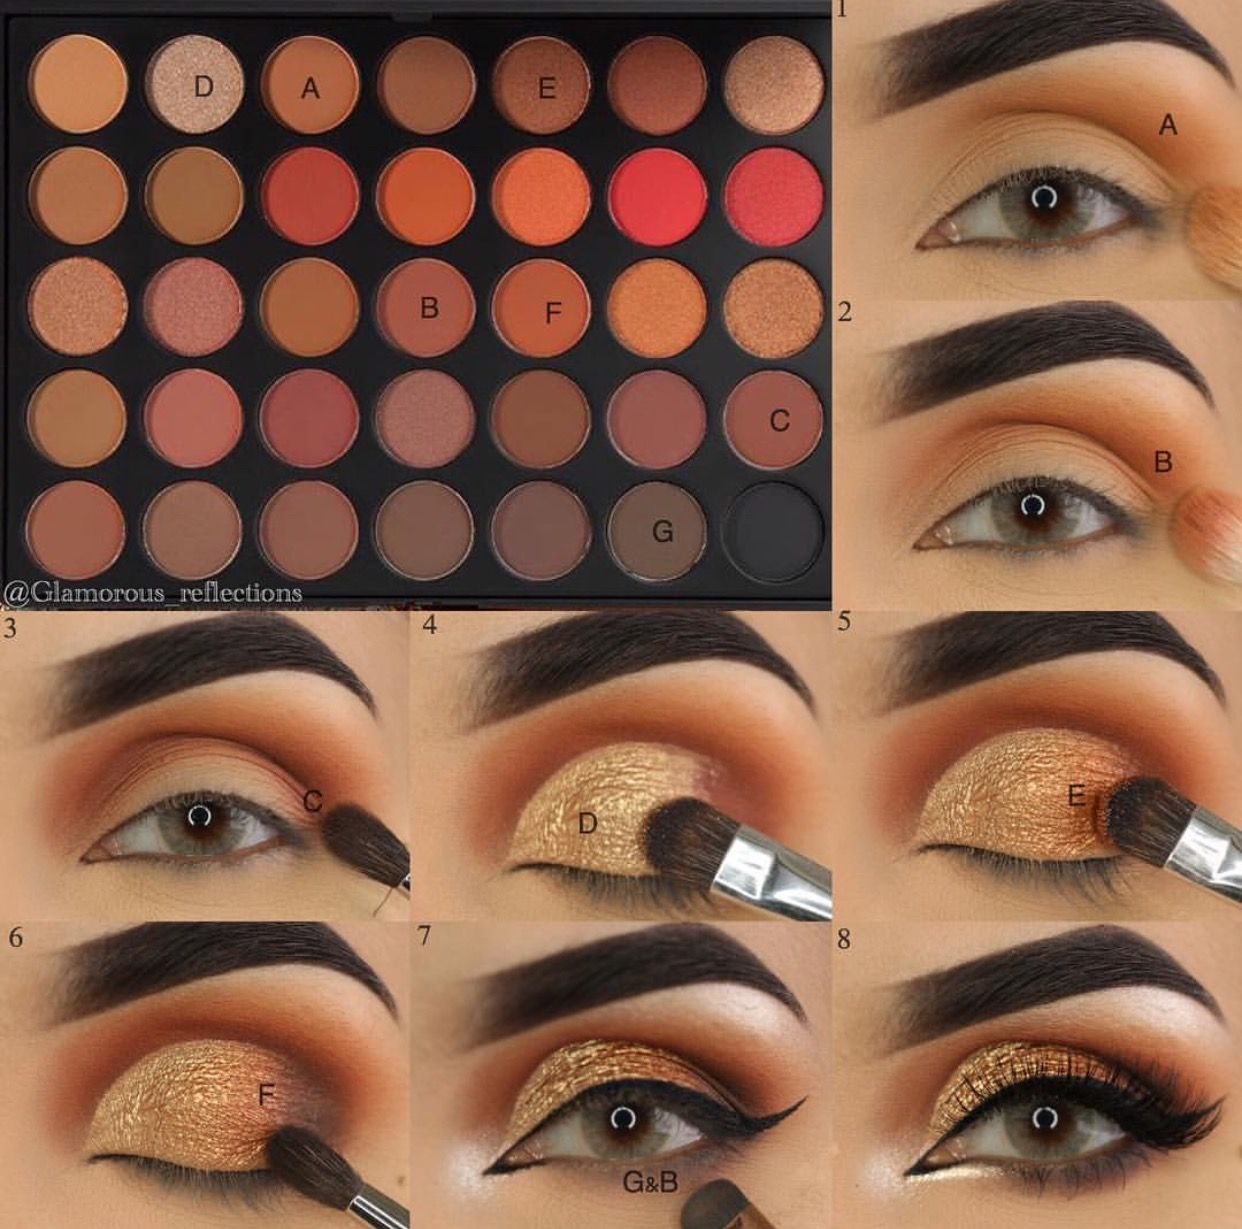 Pin by Karina Zarco on Makeup  Pinterest  Makeup Morphe and Eye